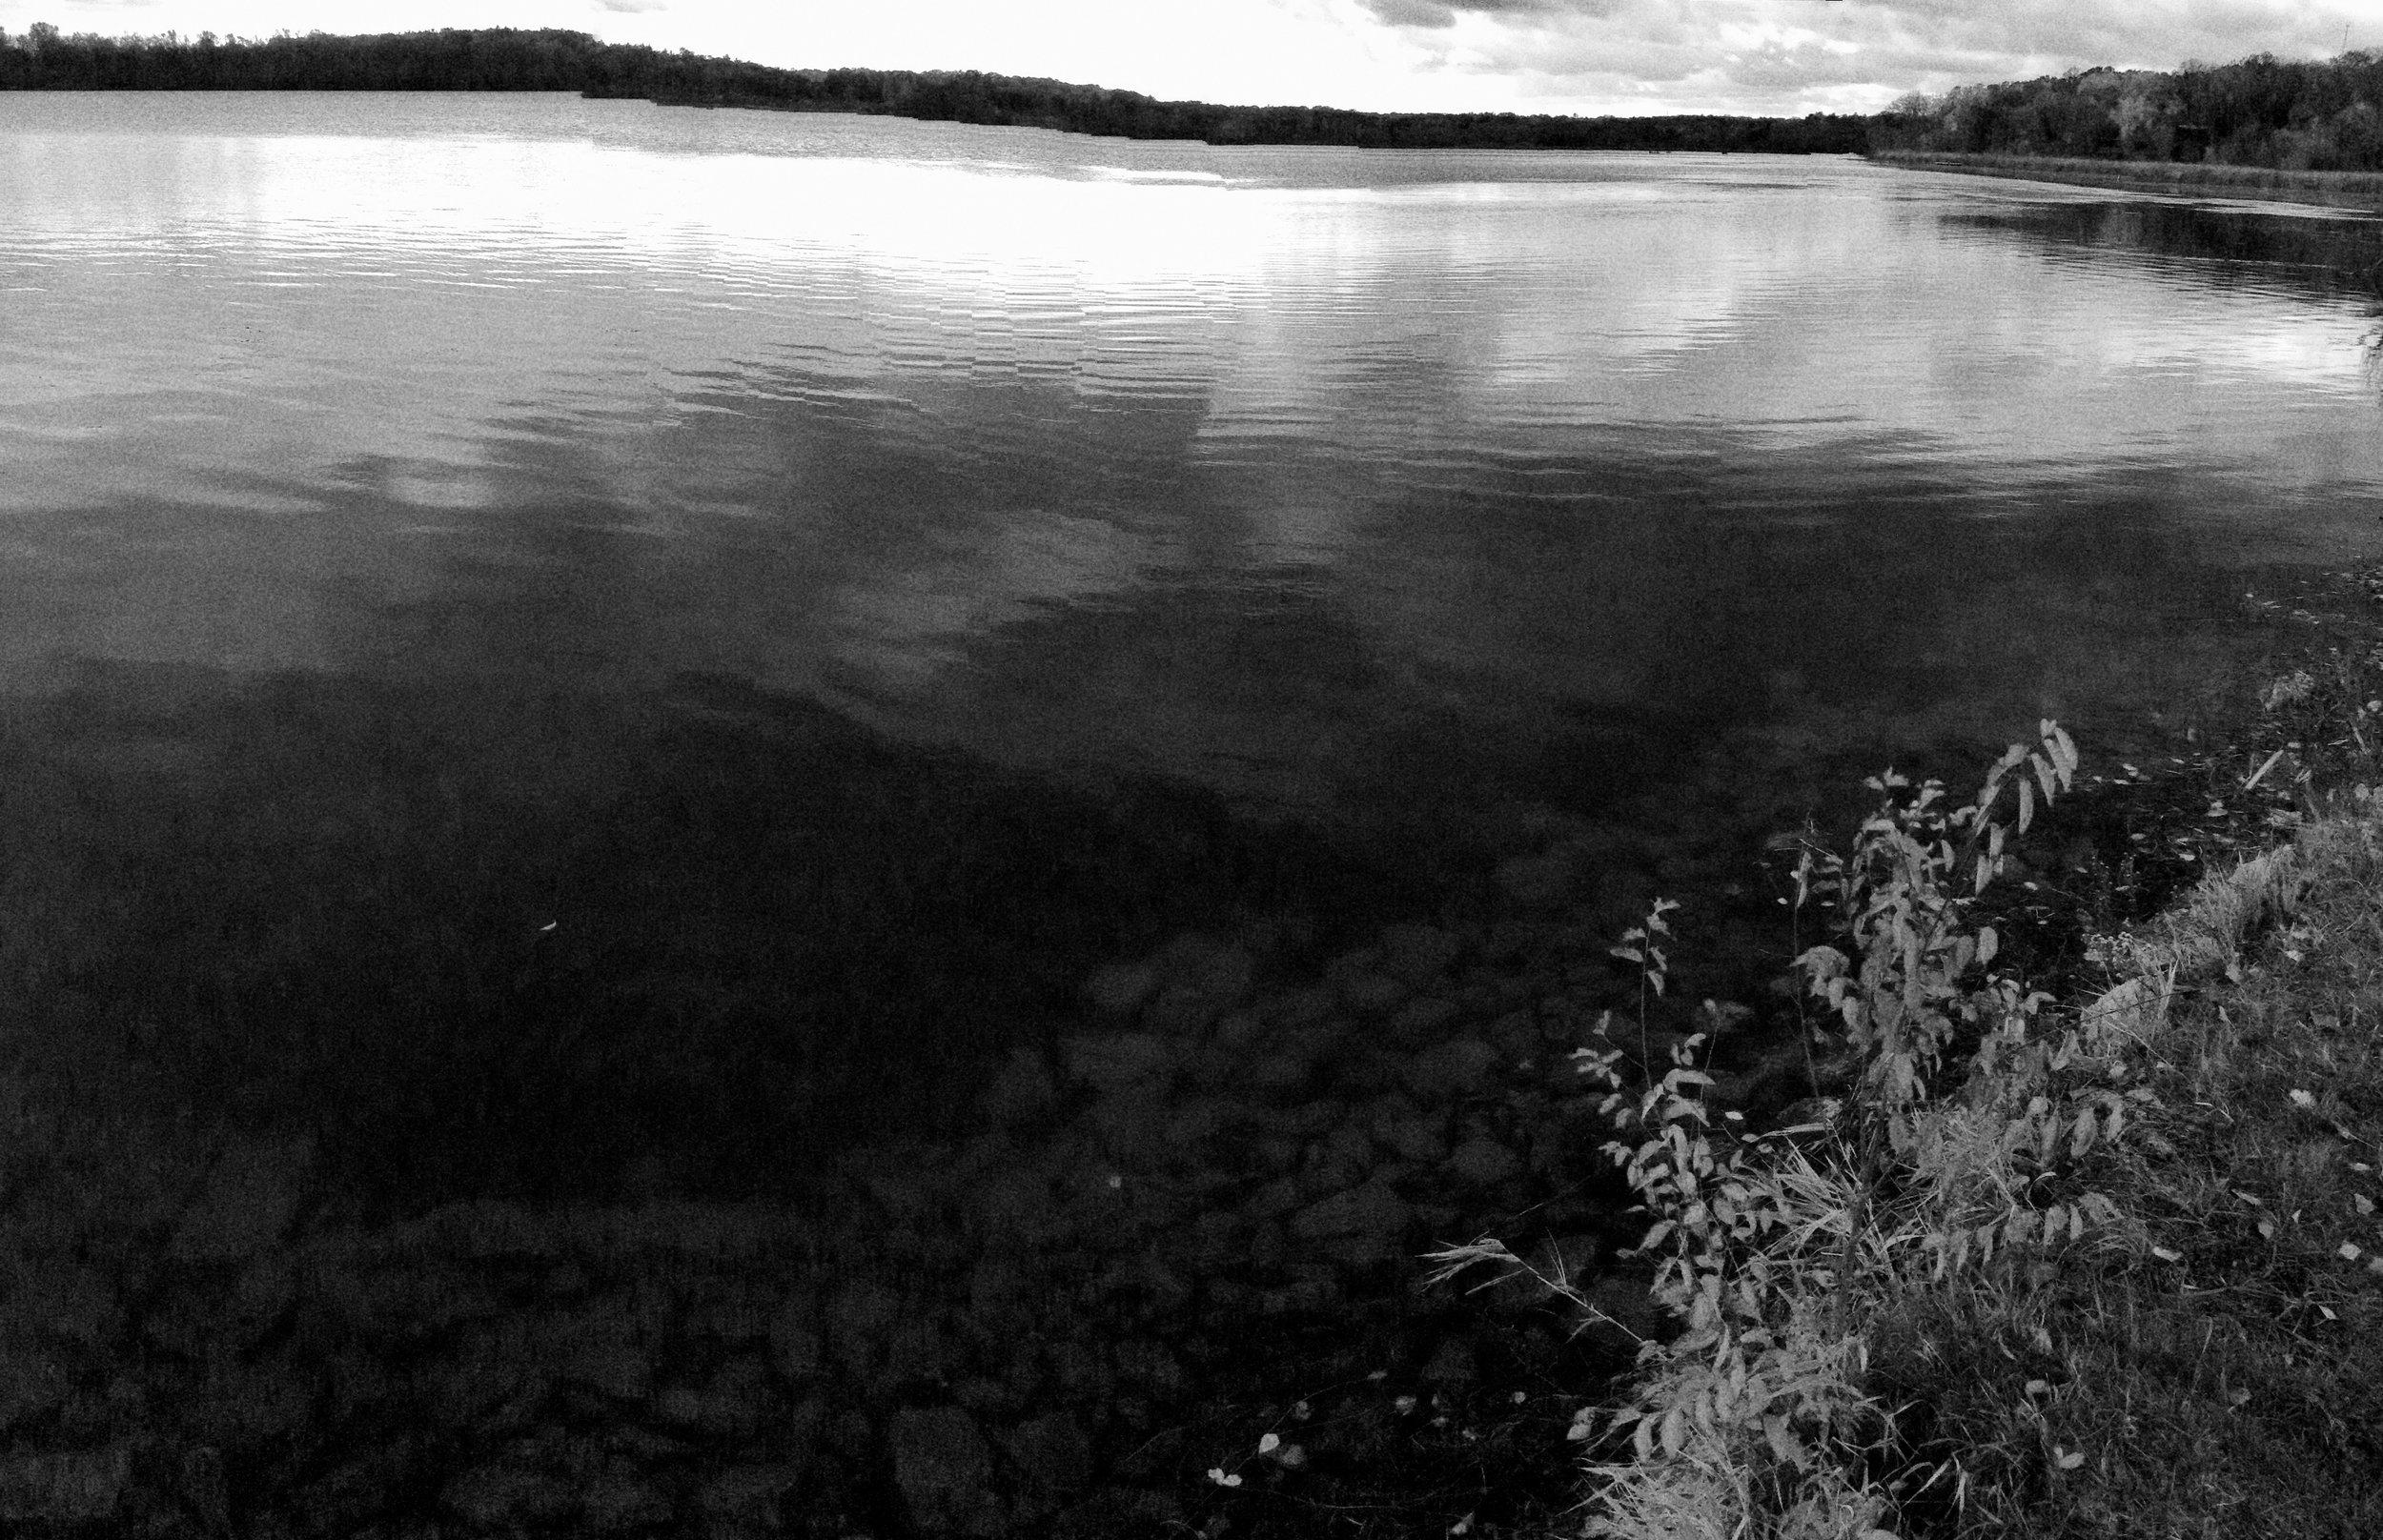 Crooked. Lake Wingra. Madison, Wisconsin. November 2013. © William D. Walker